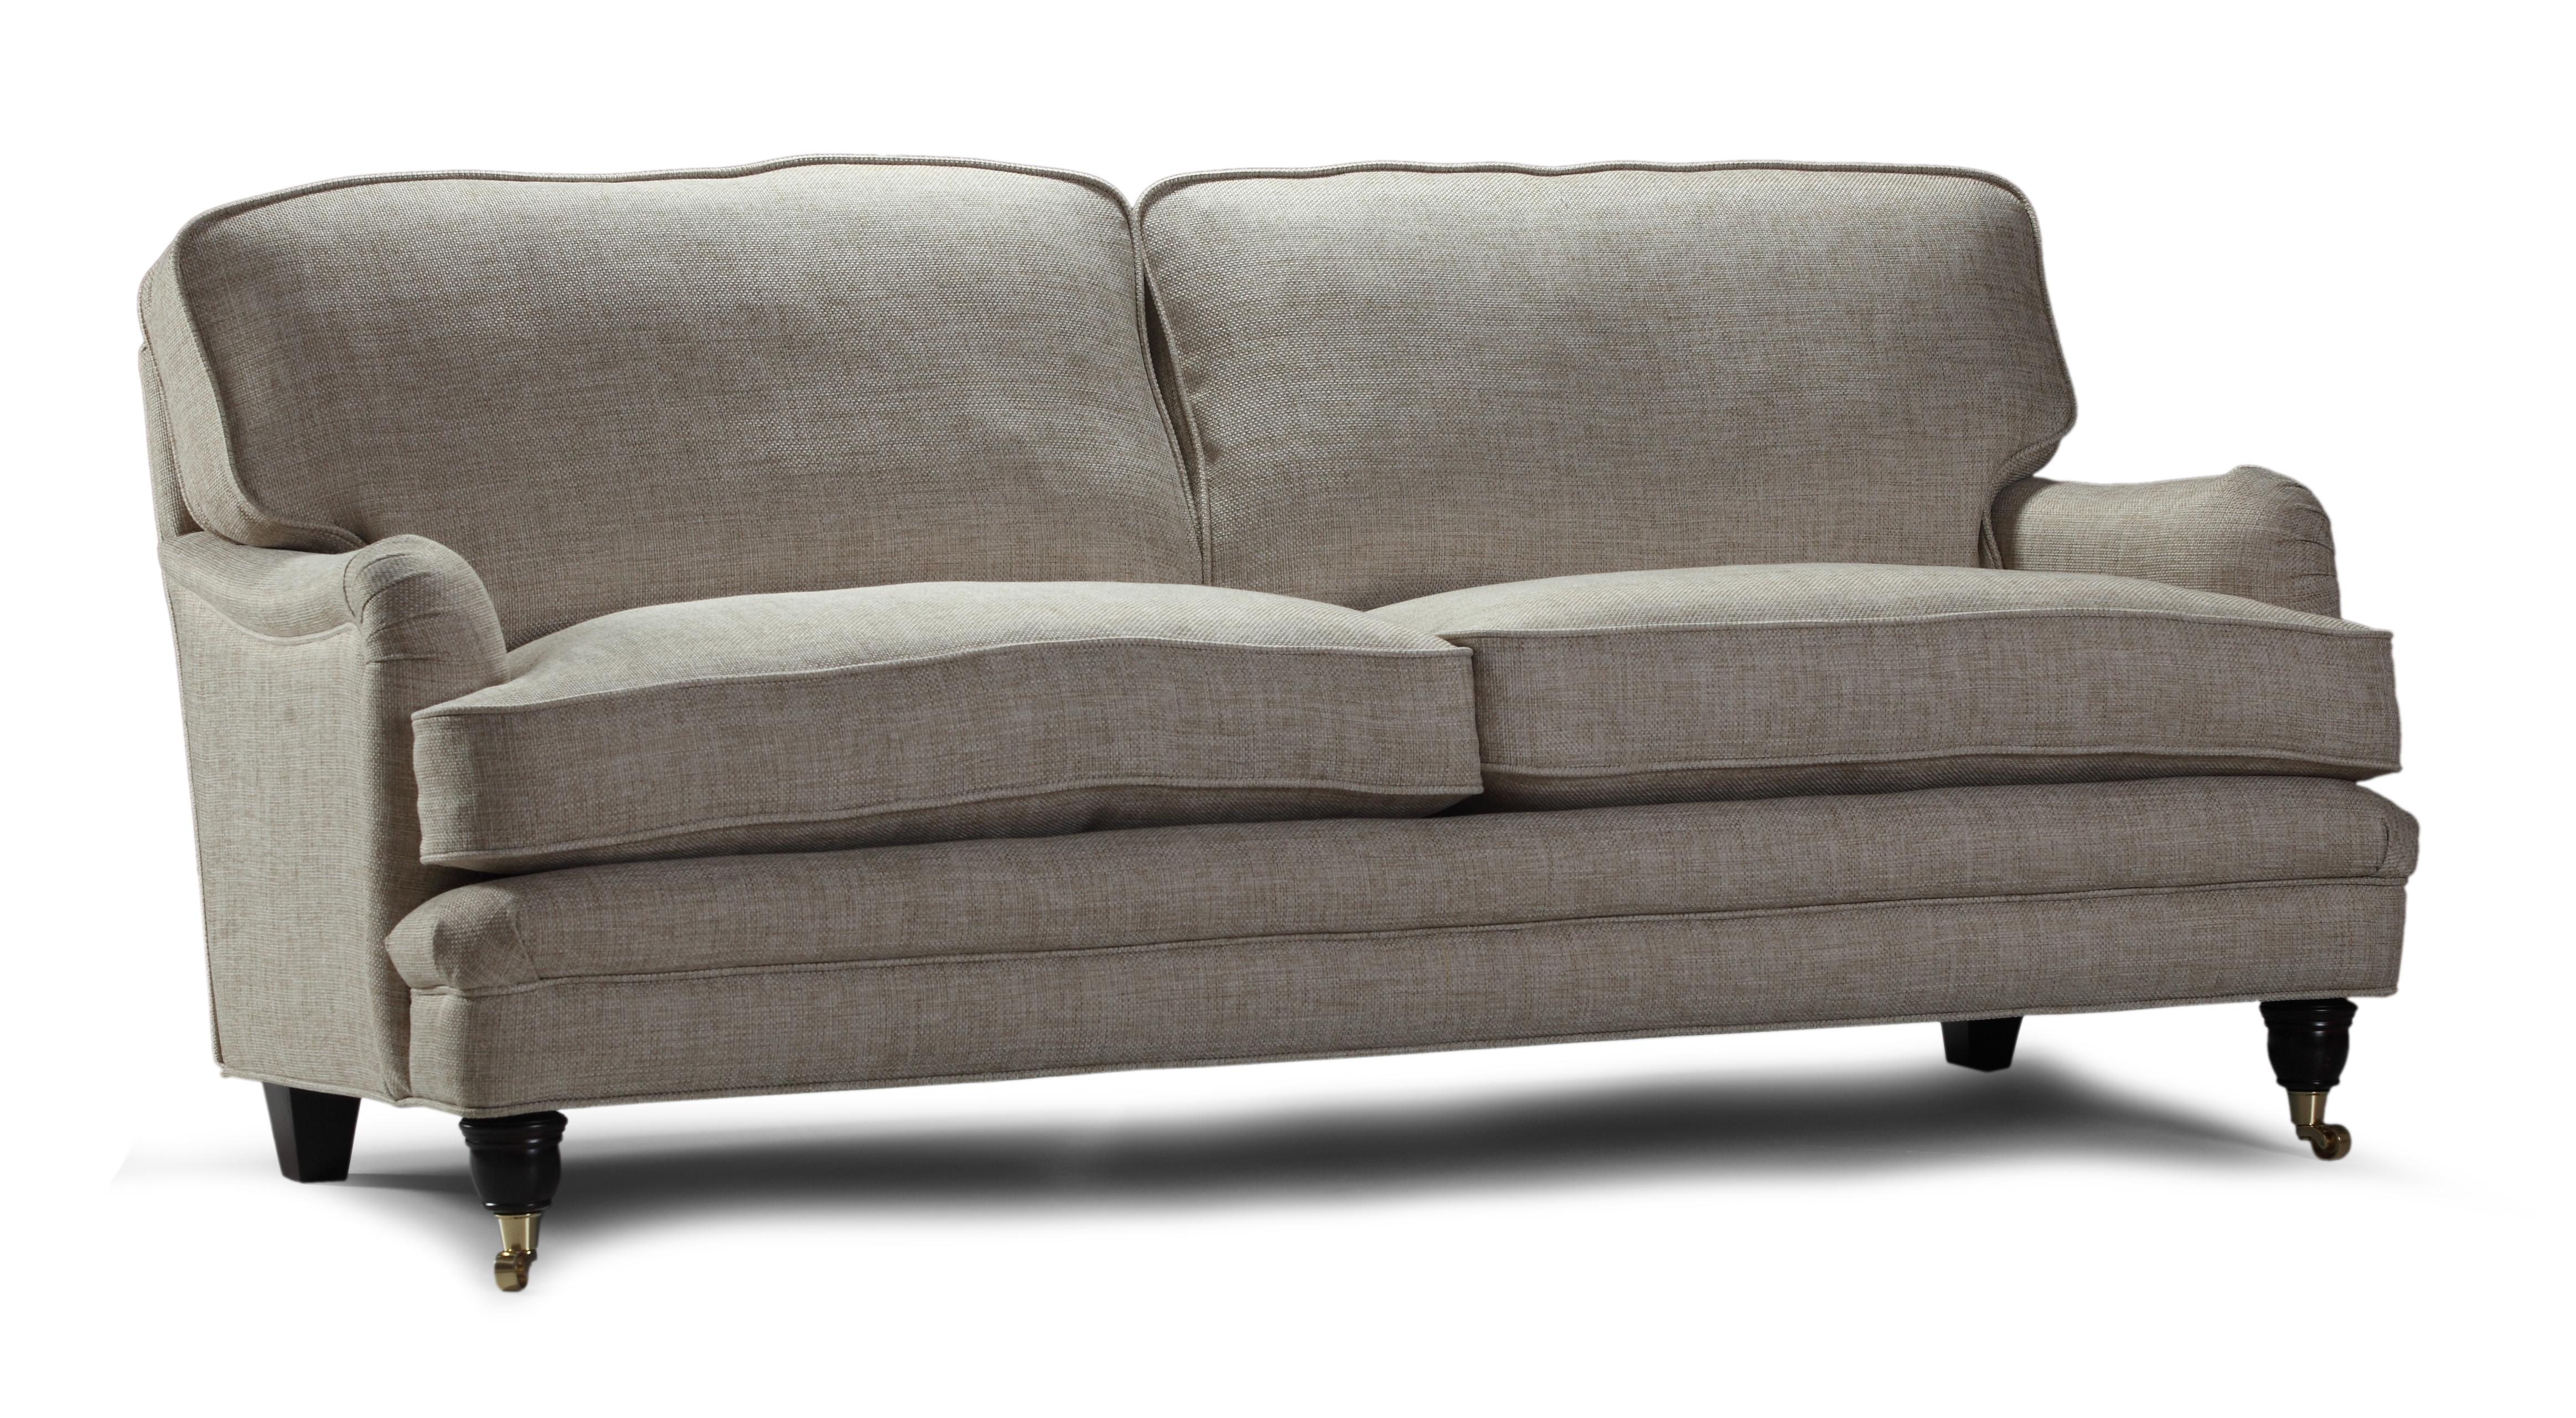 Canapea fixa 2 locuri tapitata cu stofa Ralf Grey